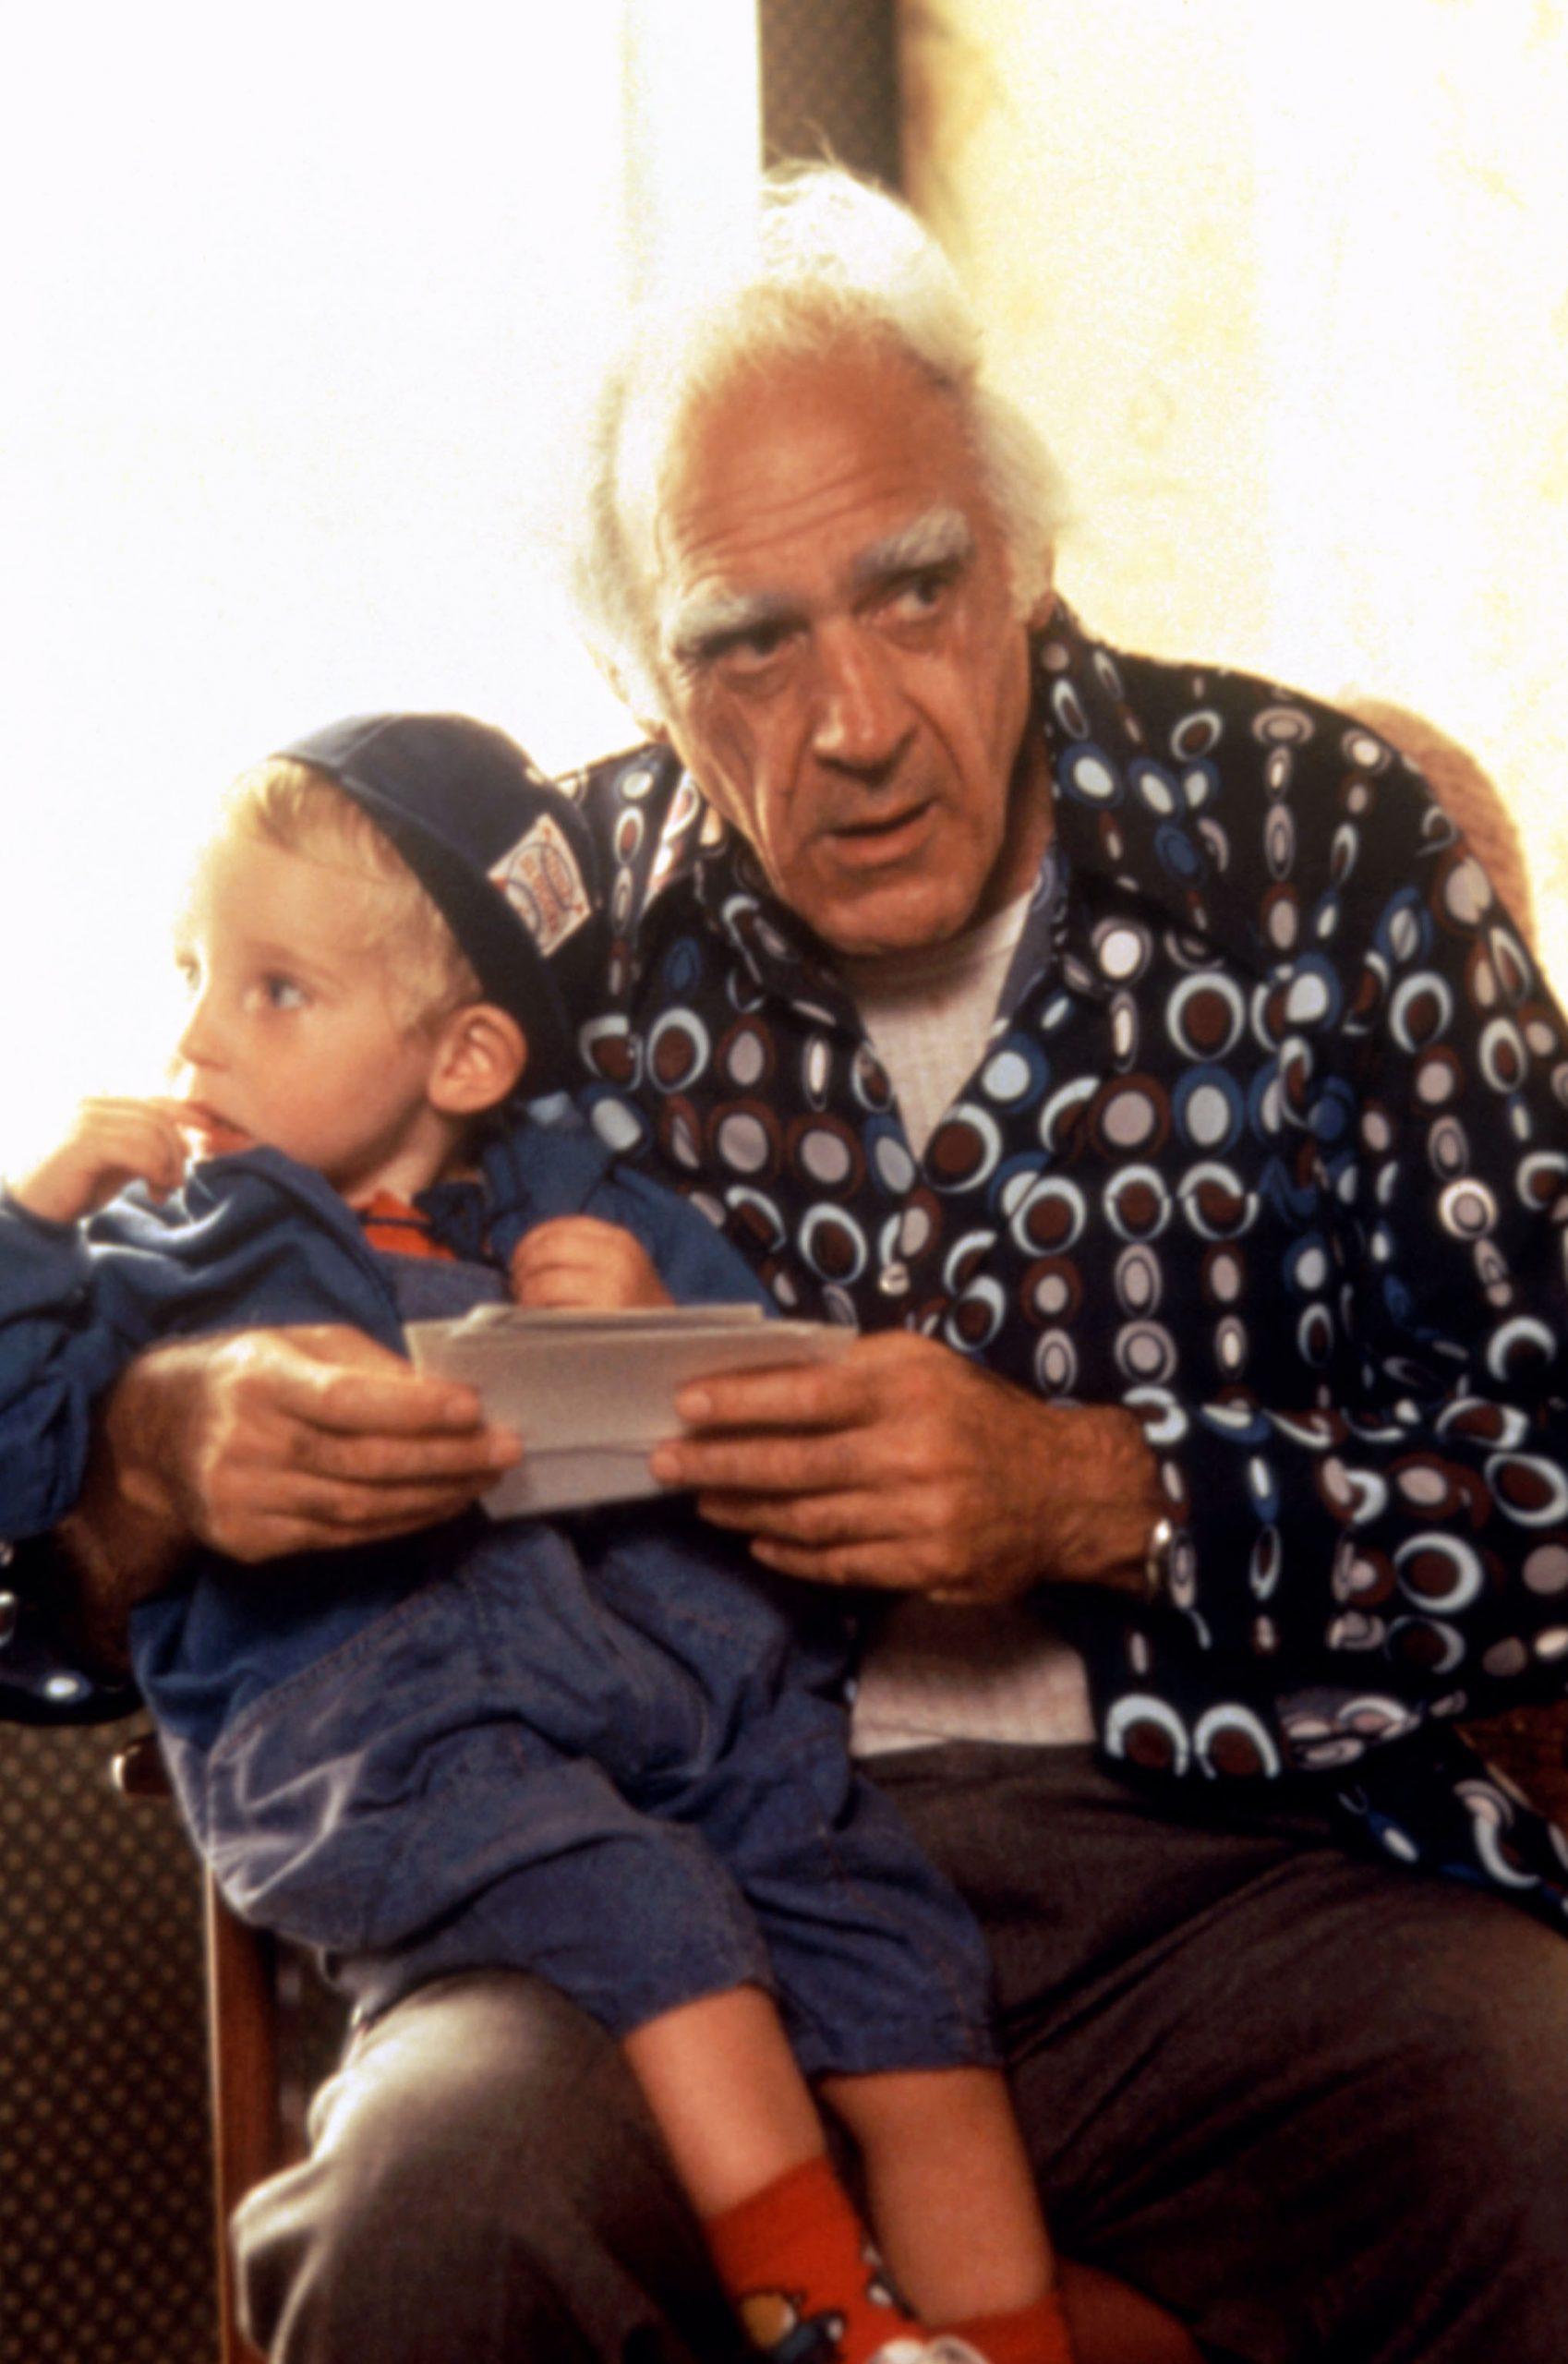 Abe Vigoda in Look Who's Talking (1989)